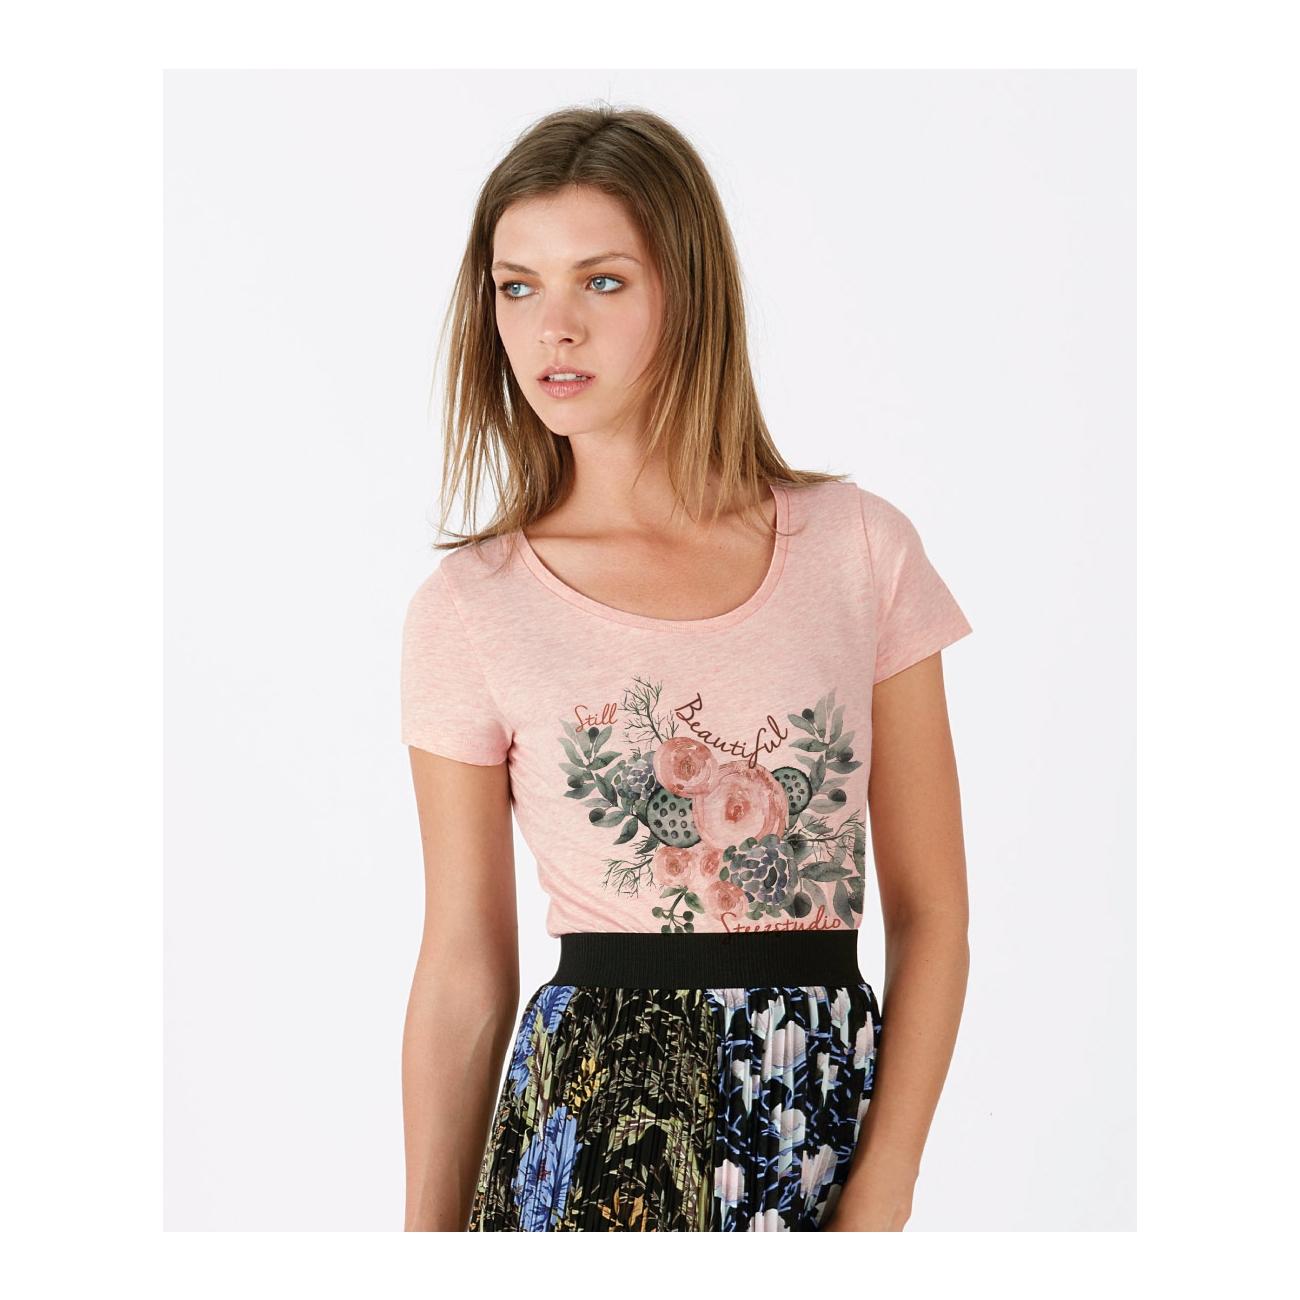 tee shirt rose tendre chin femme coton bio quitable. Black Bedroom Furniture Sets. Home Design Ideas